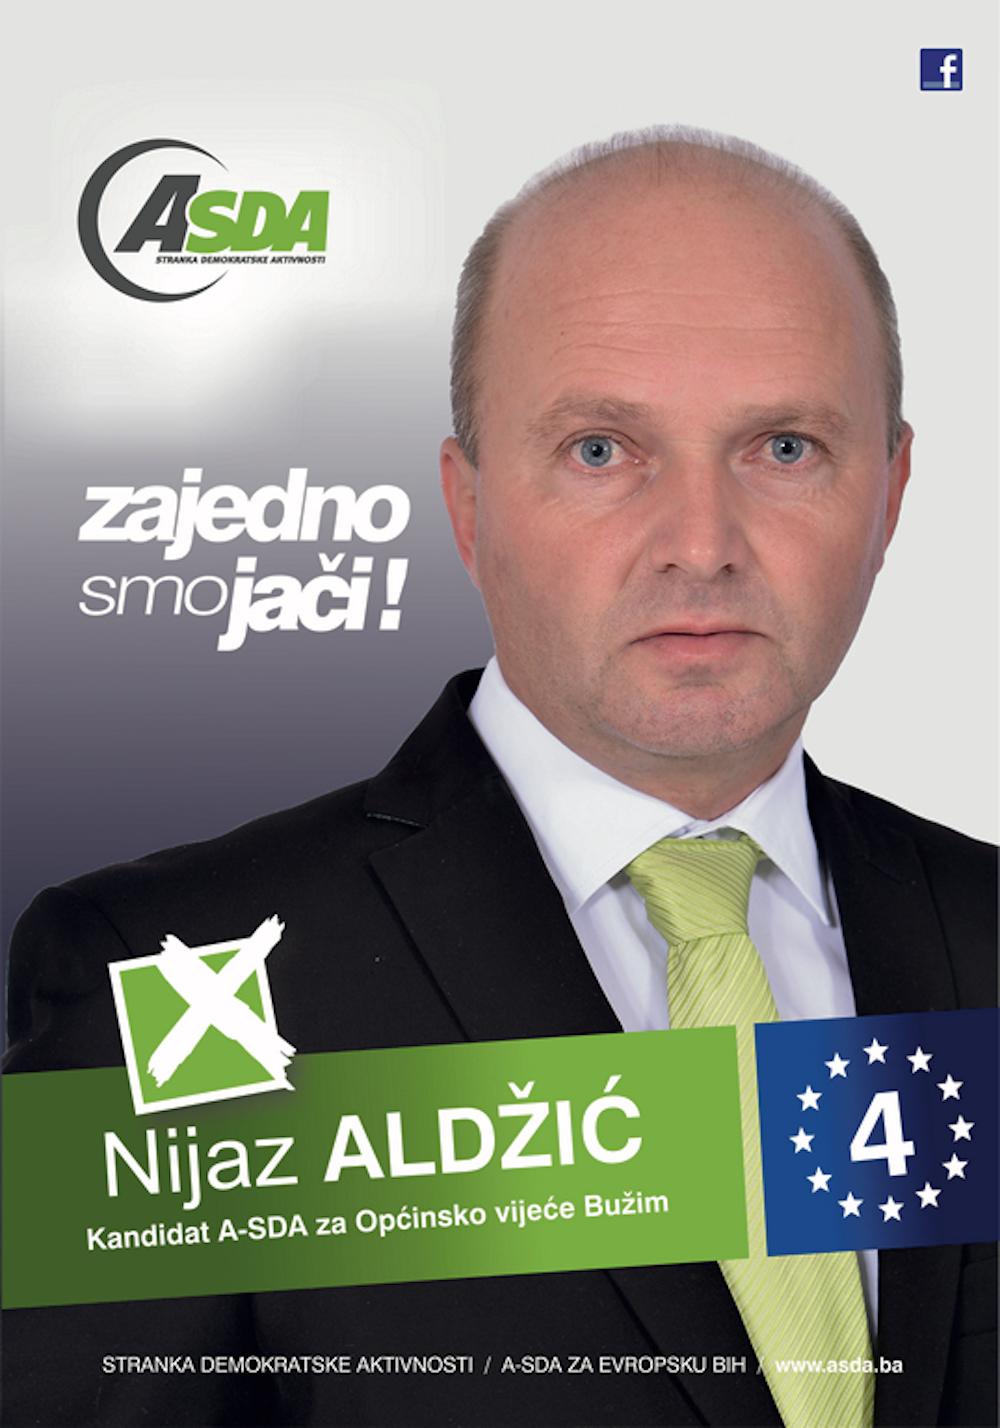 Nijaz Aldžić